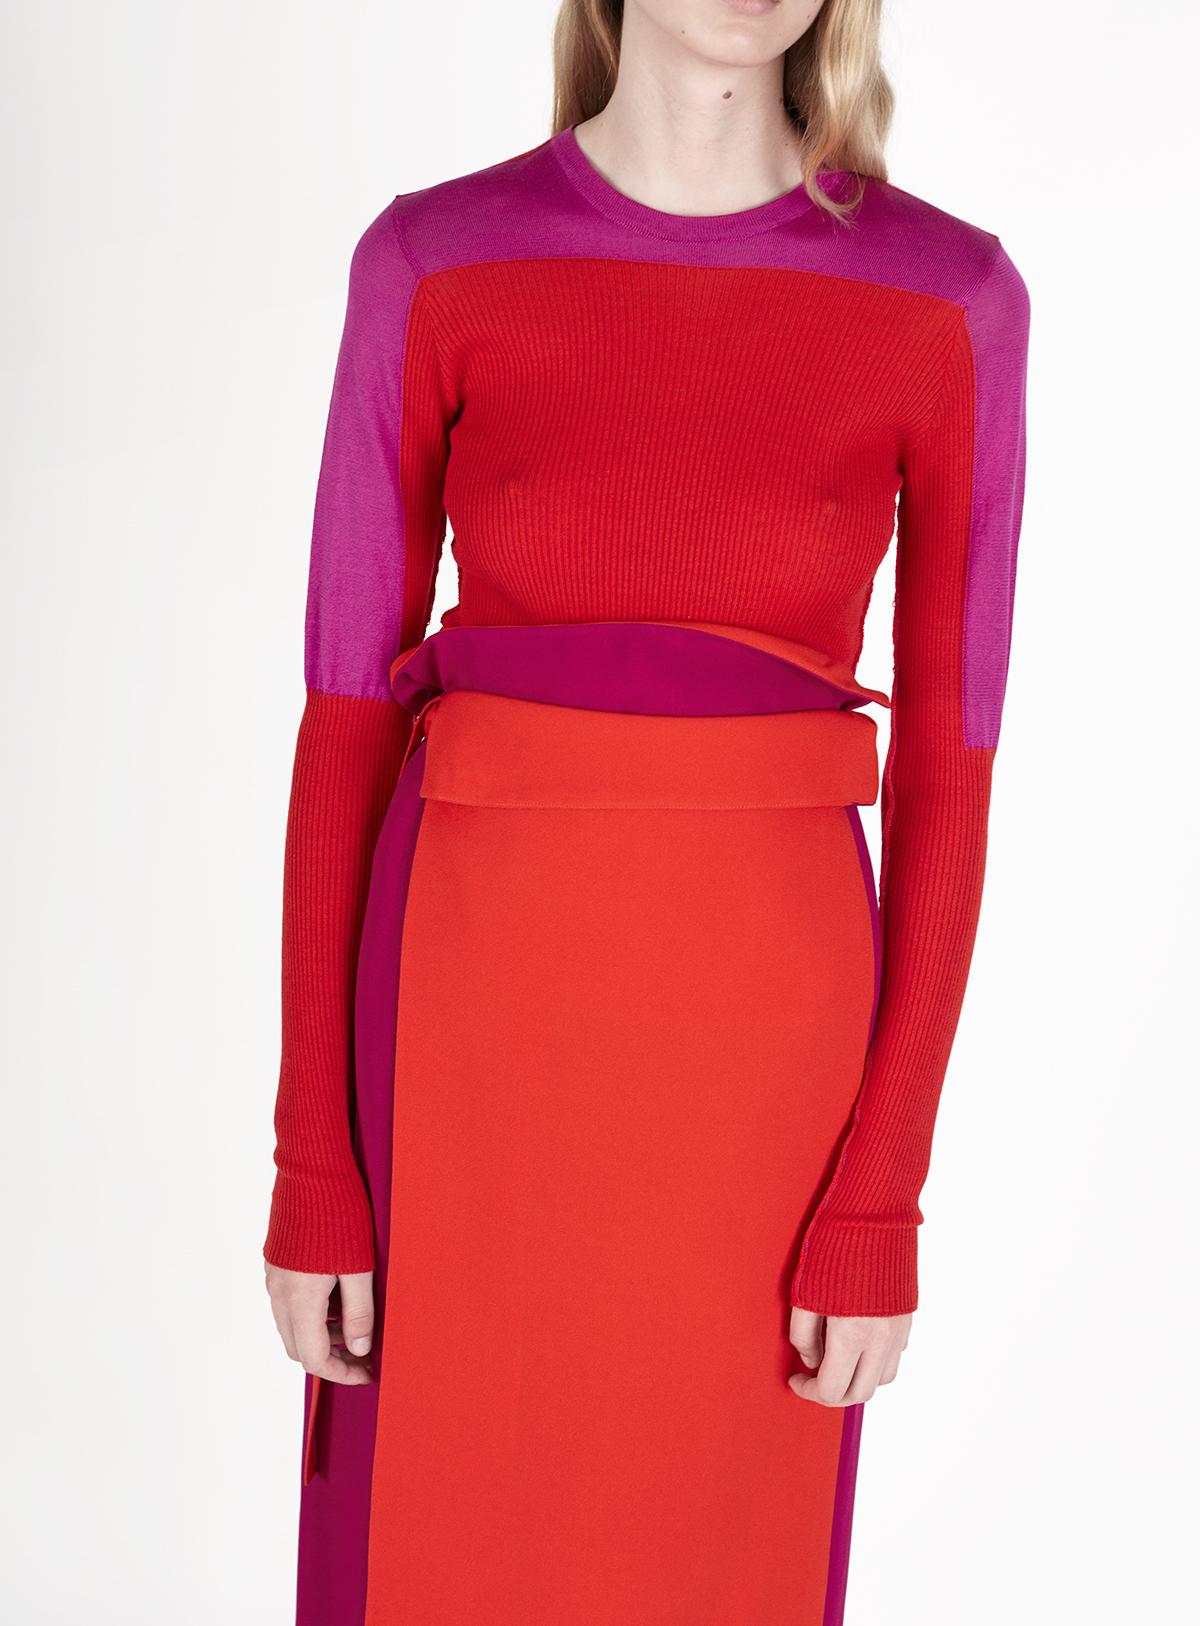 look-8 Sweater PRISSIE Skirt PATIENCE